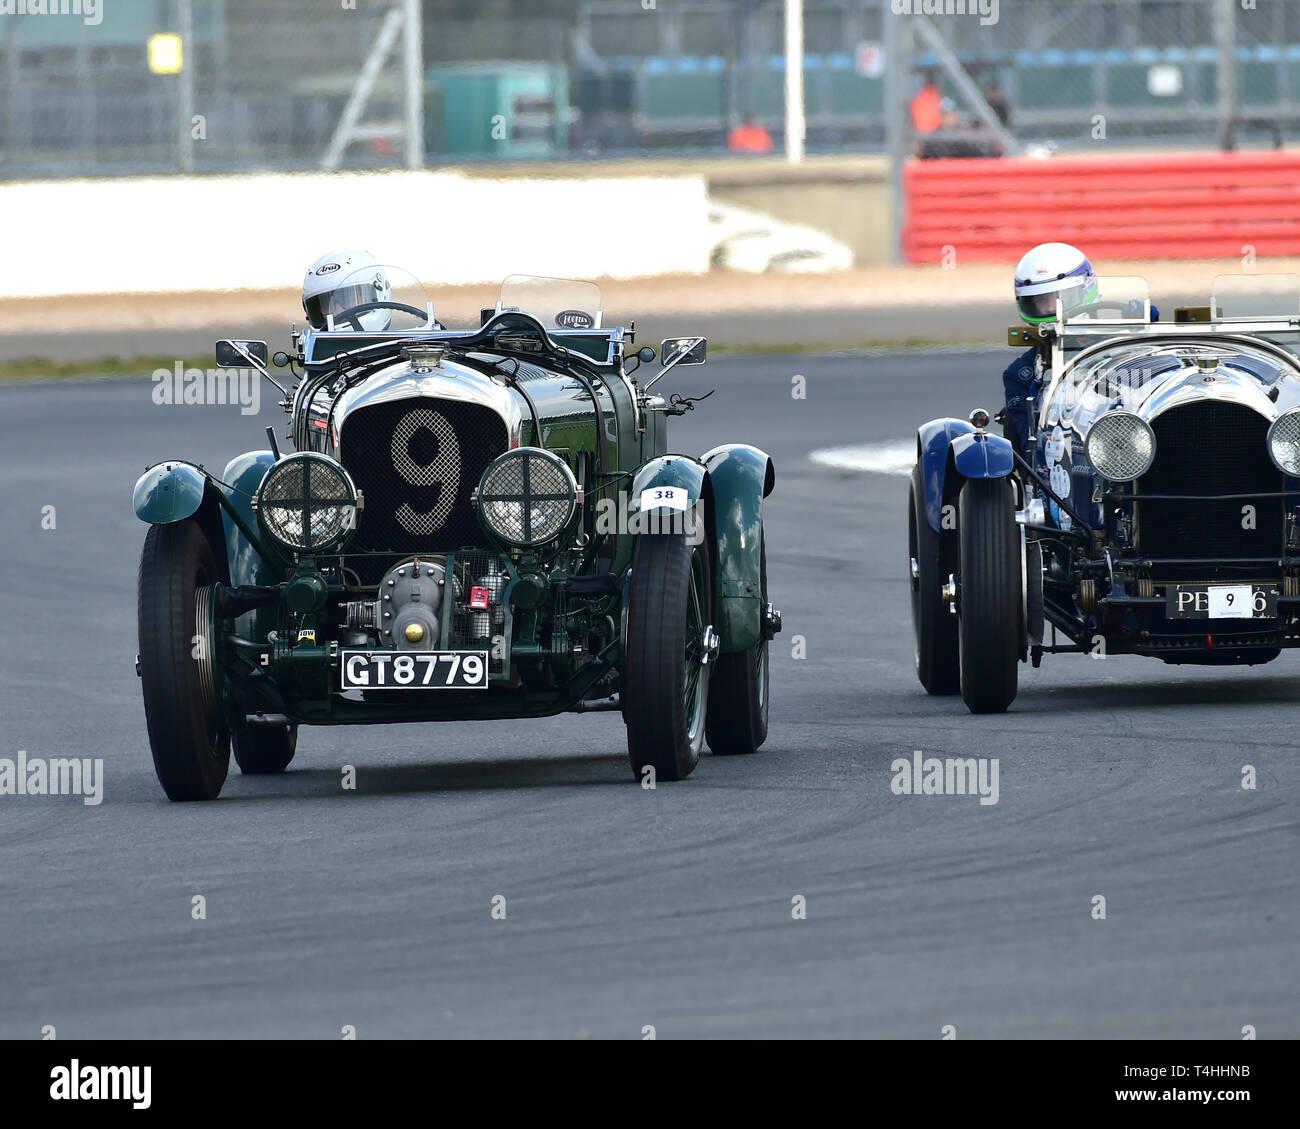 Neil Davies, Simon Arscott, Bentley 4½ Litre Blower, Benjafield 100, 100 Years of Bentley, April 2019,  Silverstone, Northamptonshire, England, circui - Stock Image